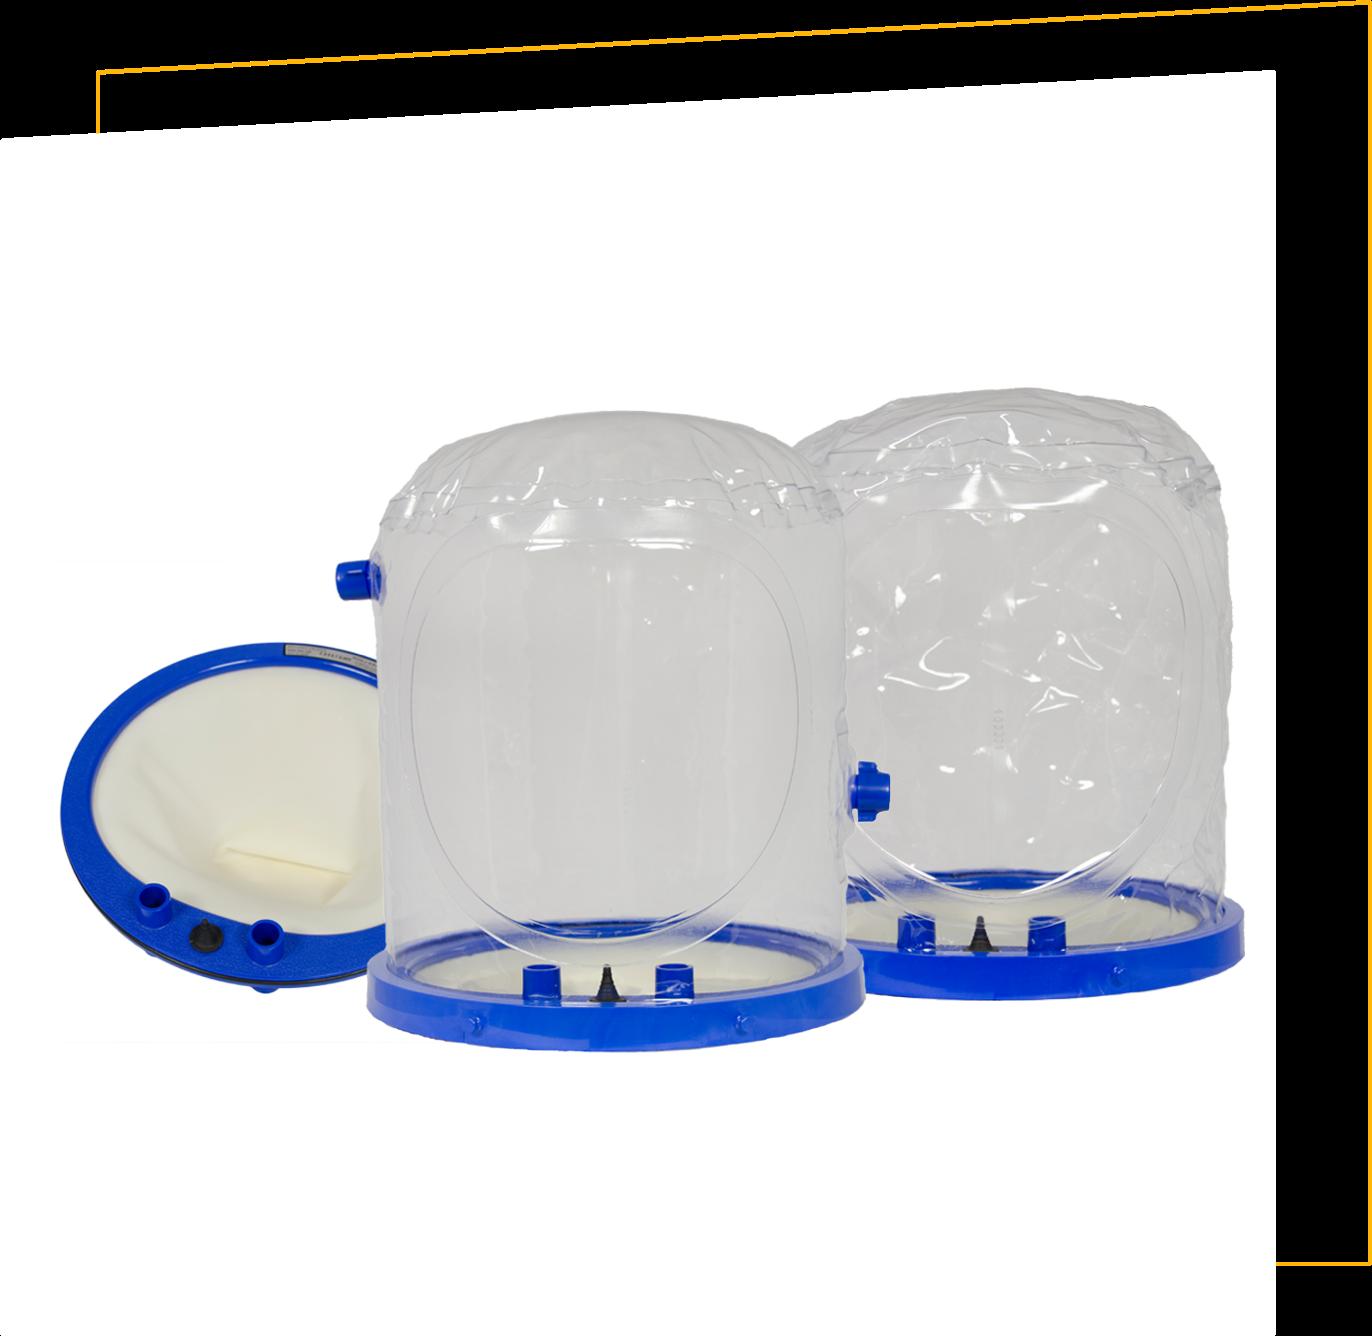 Helmet-based ventilation for covid 19